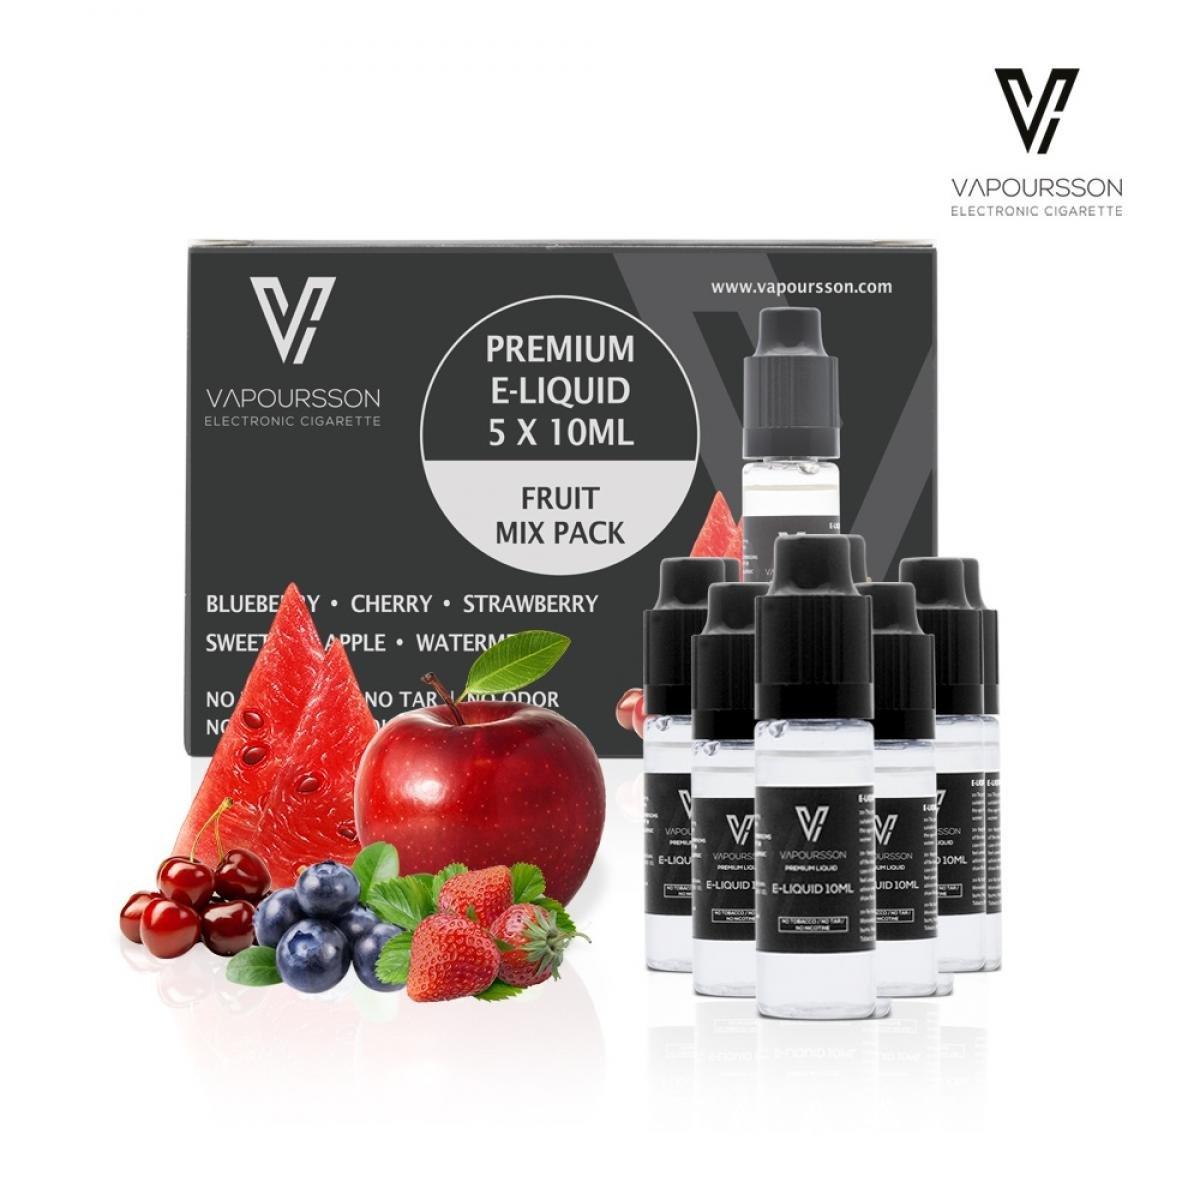 VAPOURSSON 5 X 10ml Elíquido Frutas mezcladas | Manzana - Arándano - Cereza - fresa - Sandía | Fórmula de alto nivel para un sabor extra fuerte | ...